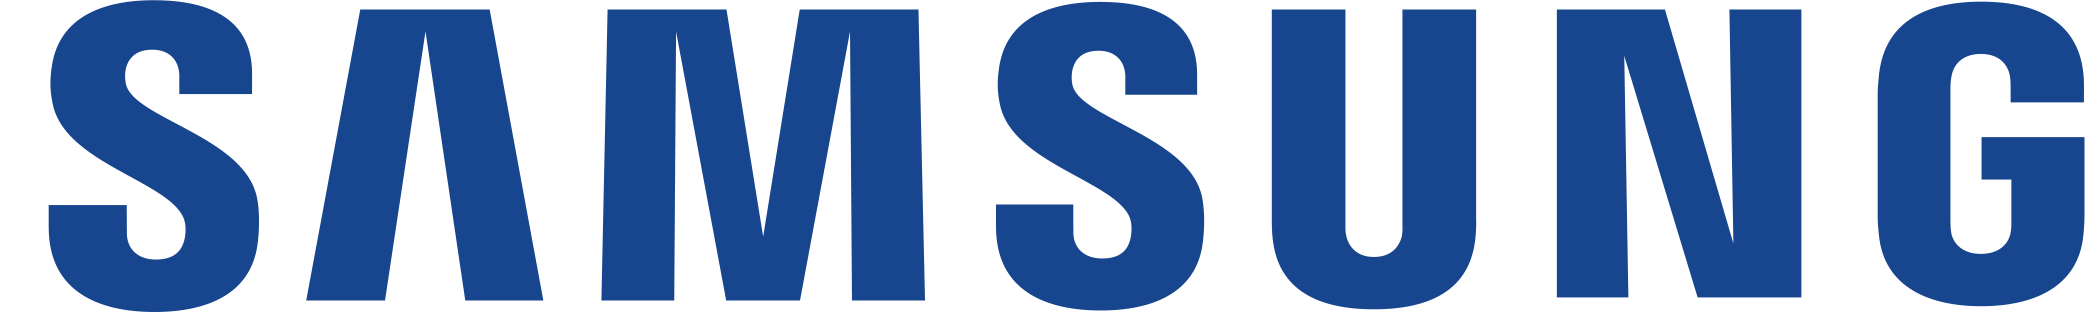 Samsung - Samsung Logo PNG